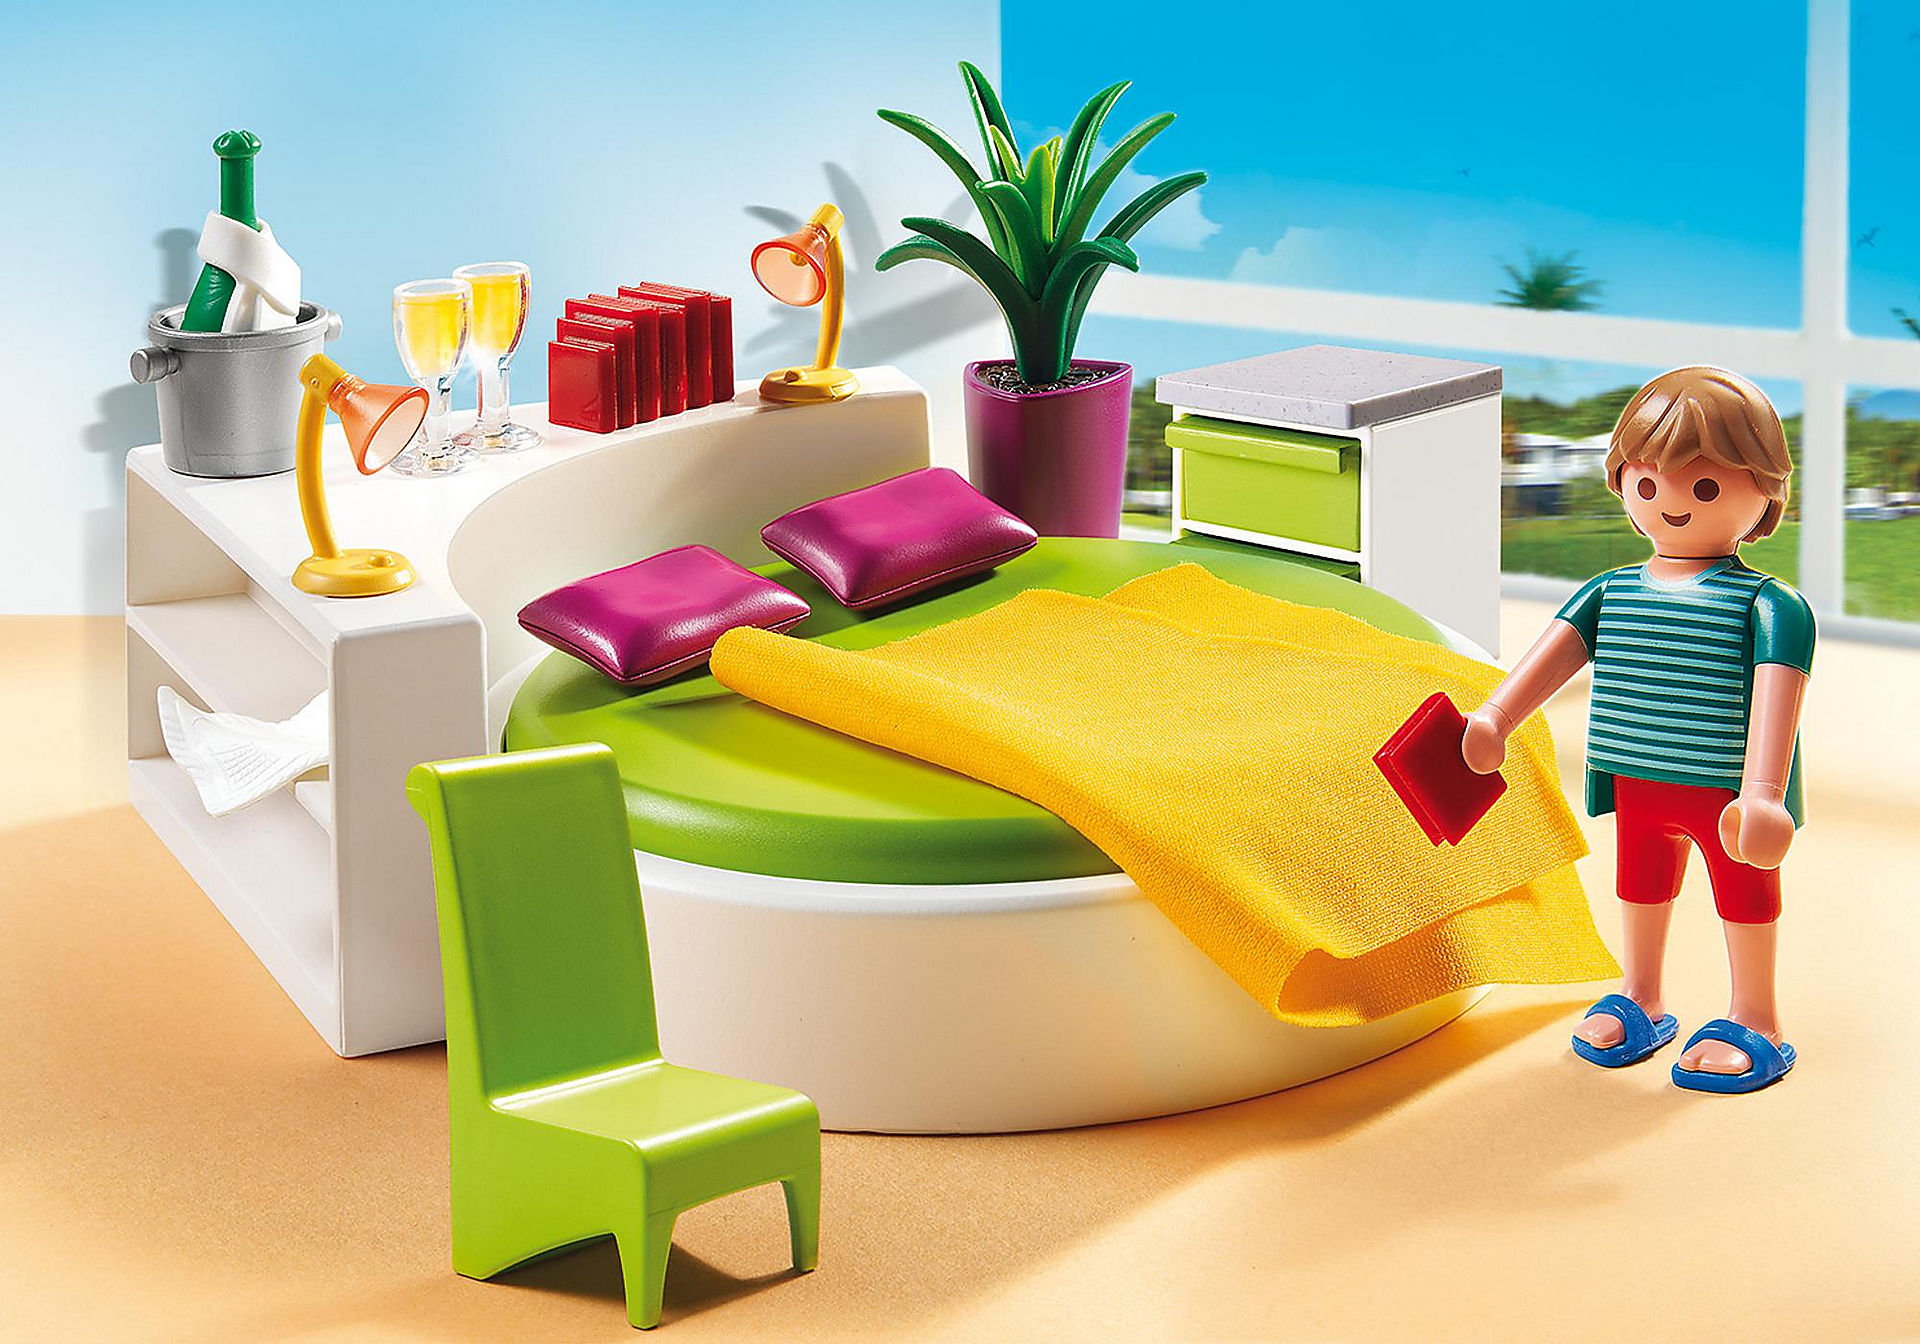 http://media.playmobil.com/i/playmobil/5583_product_detail/Chambre avec lit rond